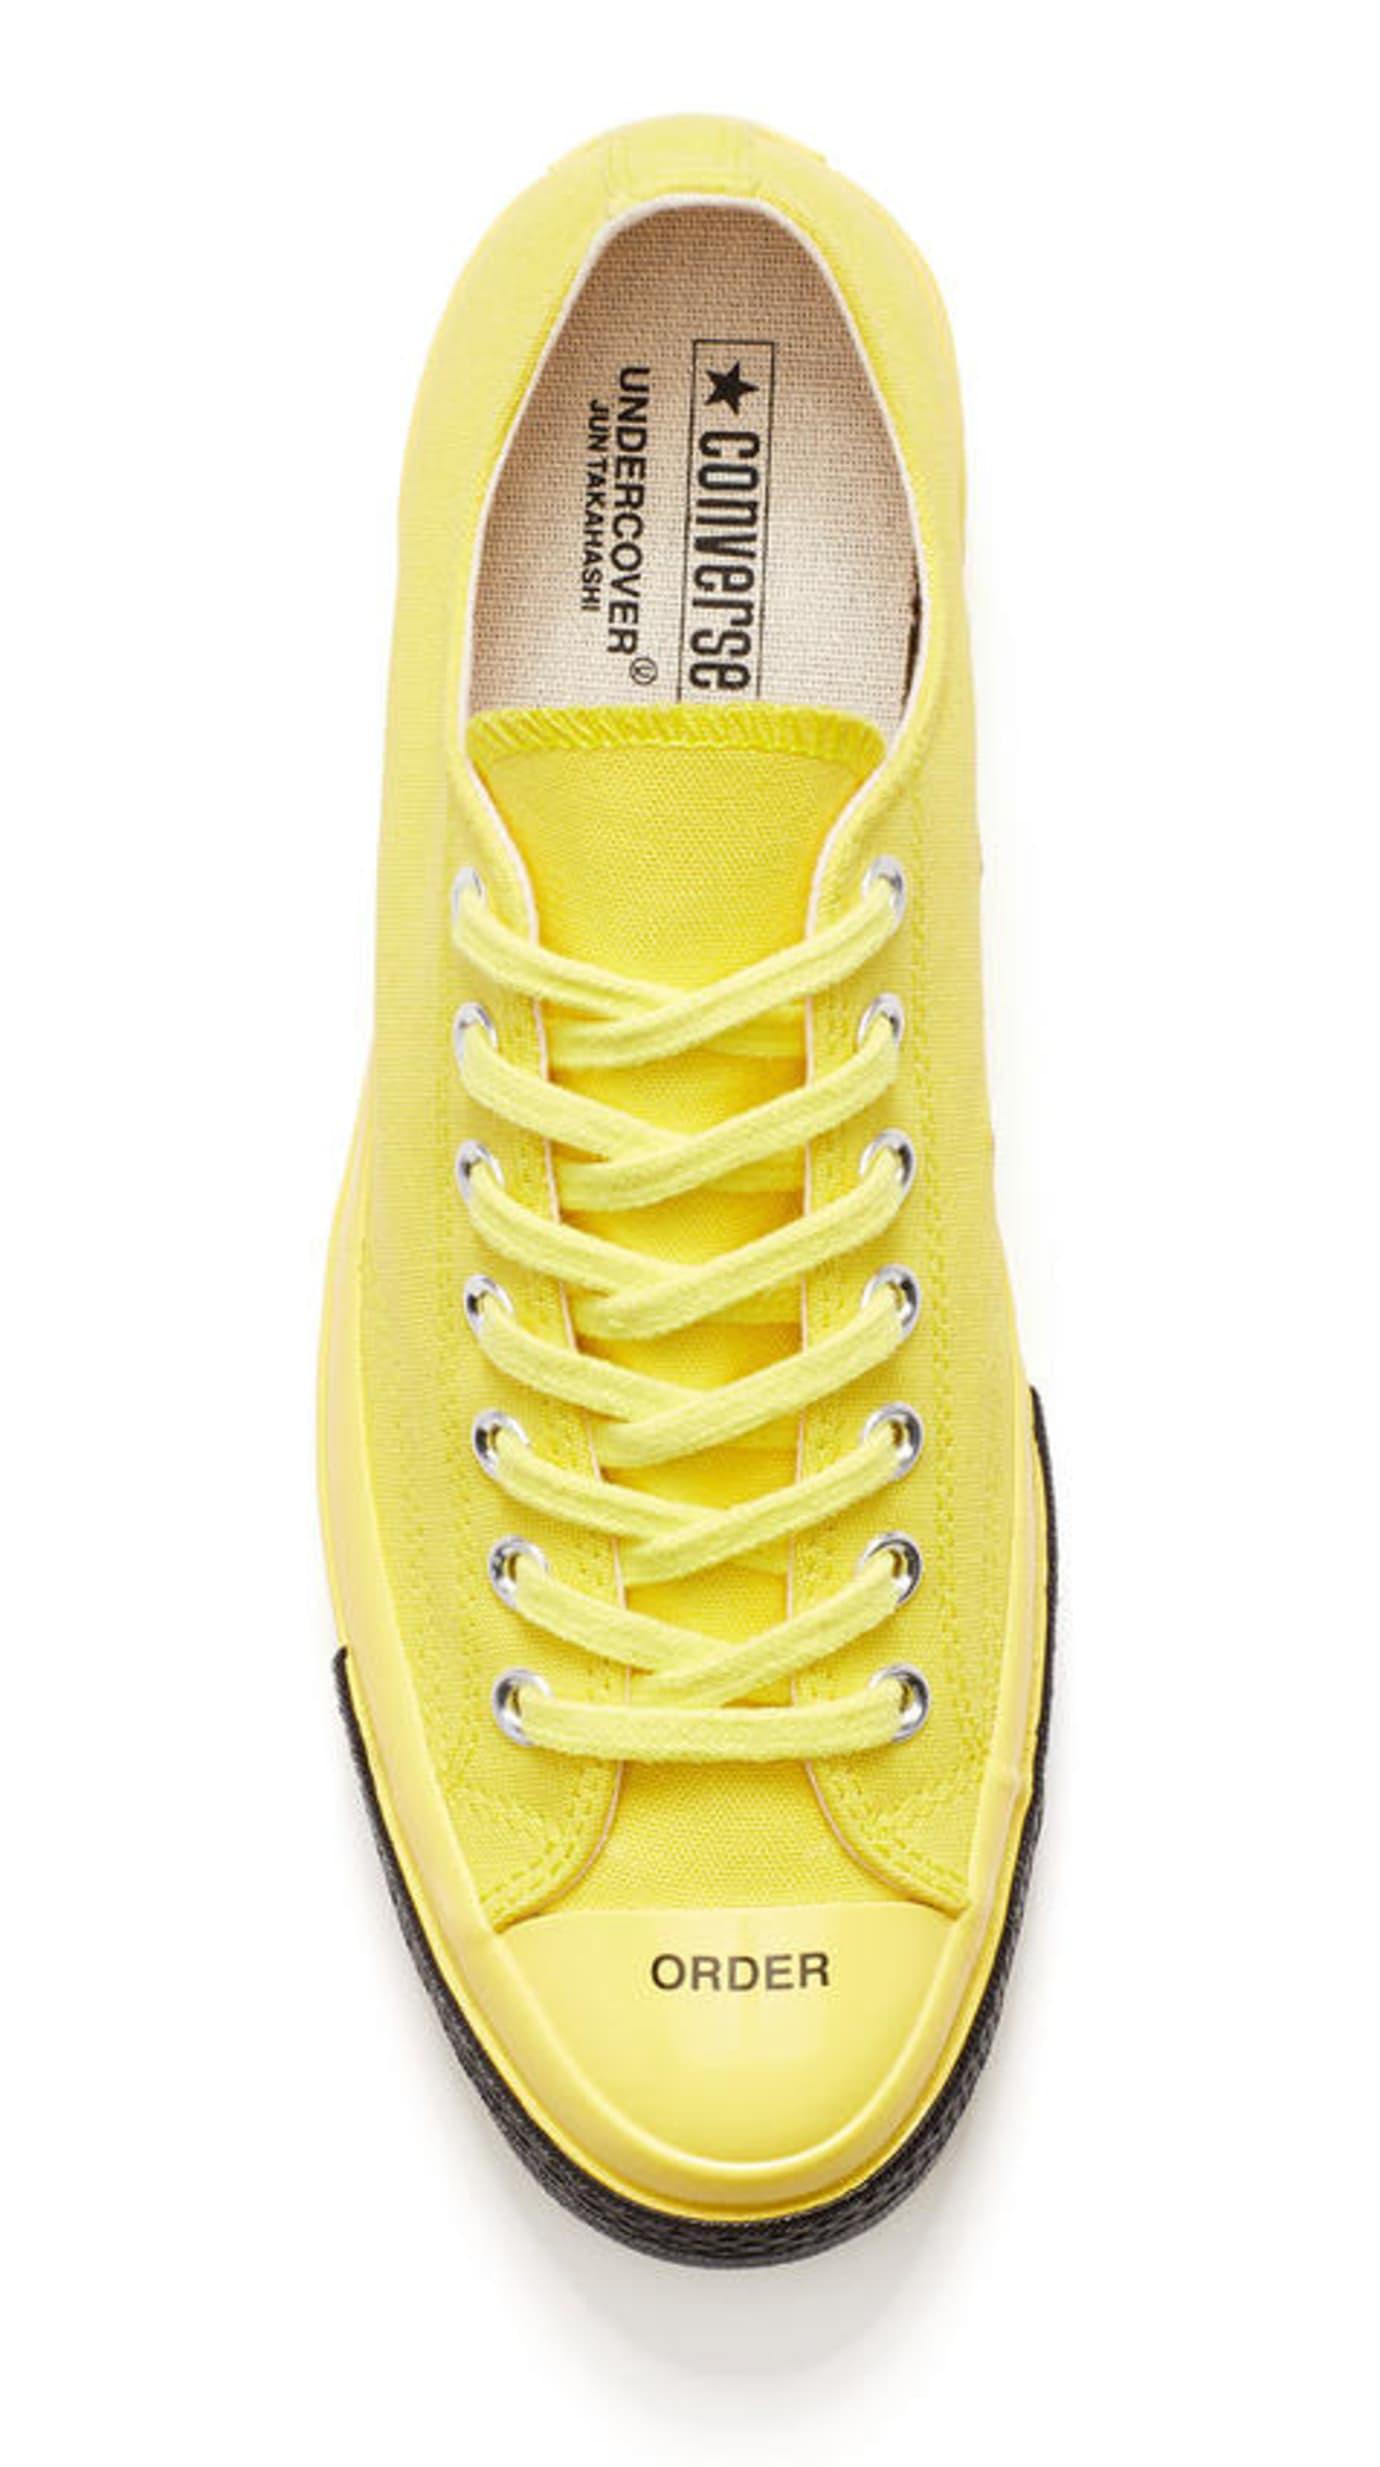 Undercover x Converse Chuck 70 'Yellow' (Top)